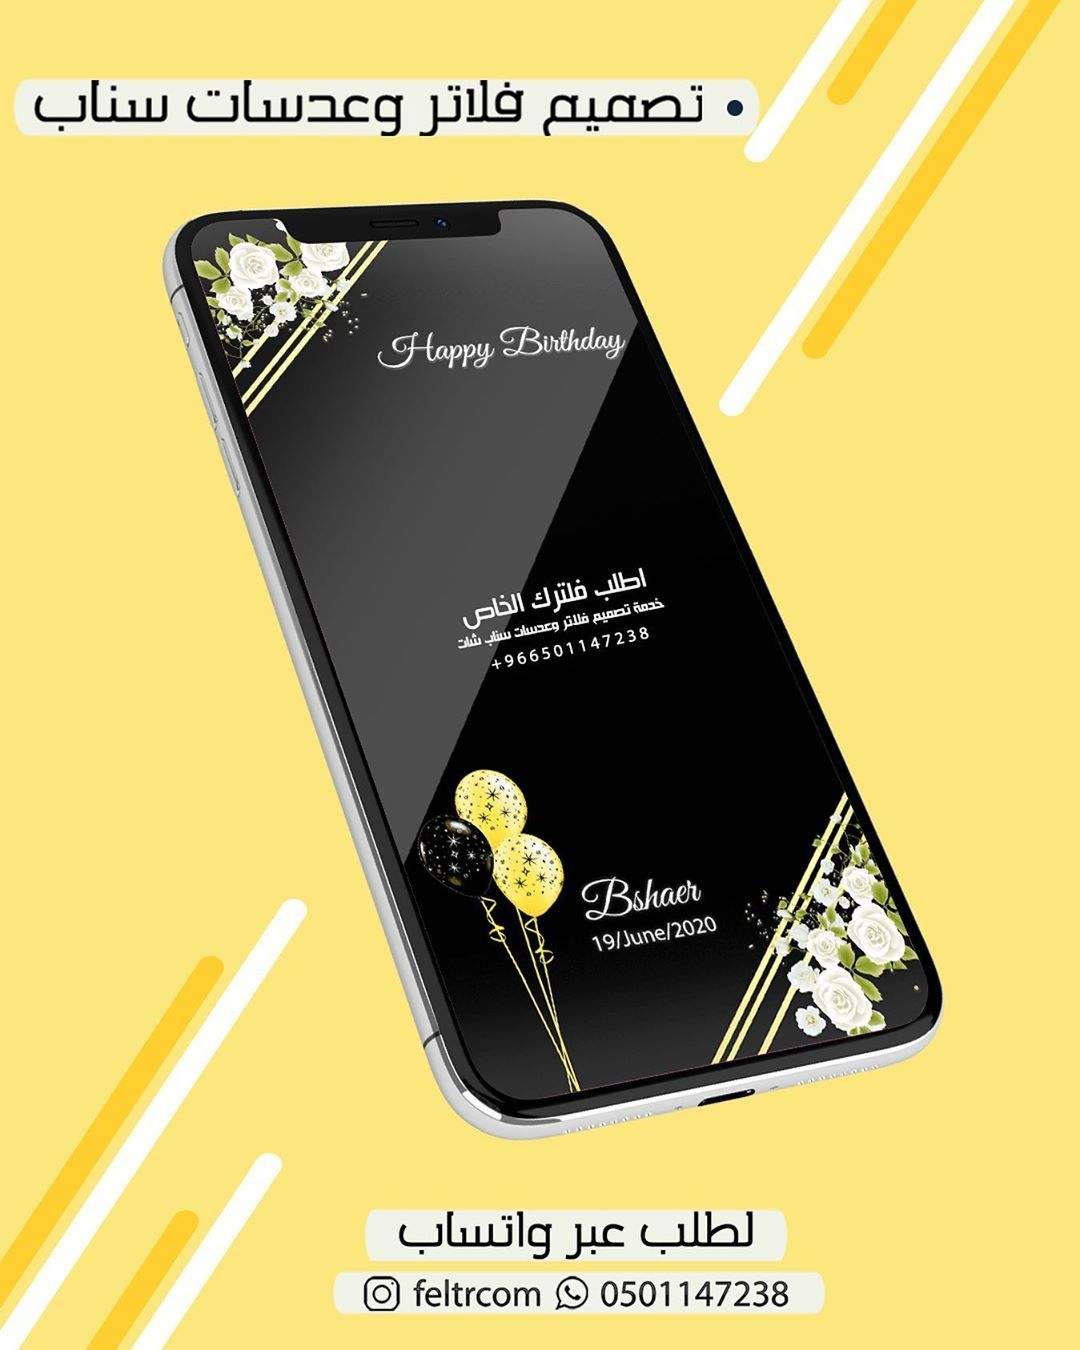 فلاتر و عدسات سناب Feltrcom Instagram Photos And Videos Whatsapp Message Samsung Galaxy Phone Messages